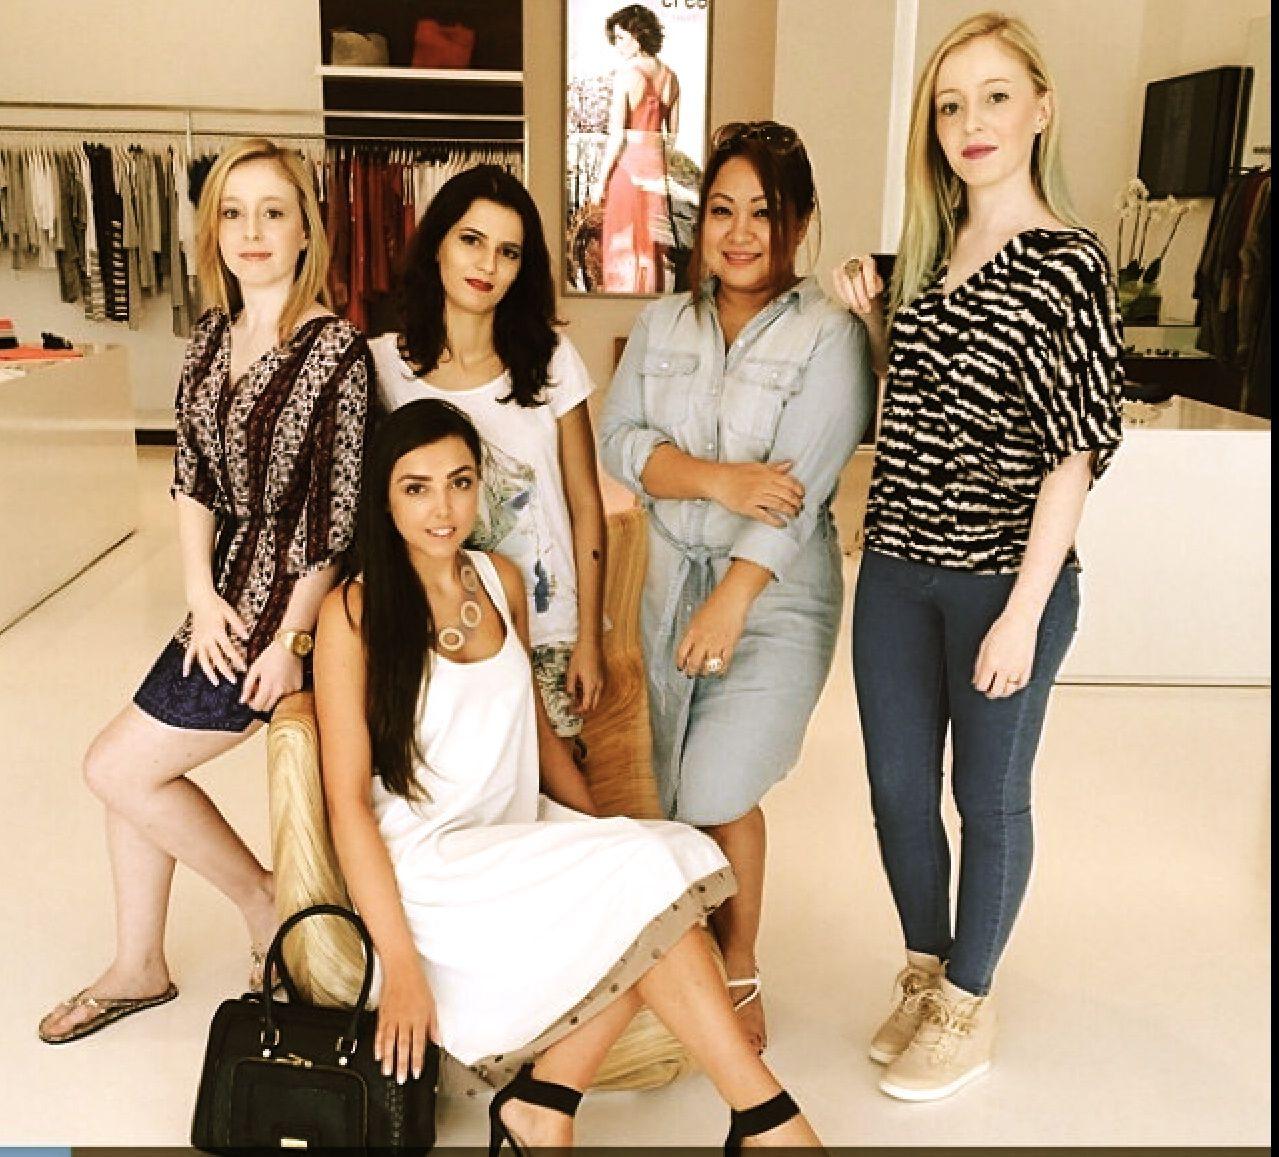 Marla Girls #fashion #ootd #outfit #streetstyle #ootw #fblogger #tagsforlikes #dubai #dubaistreetstyle #dubaifashionblogger #lookbook #handbags